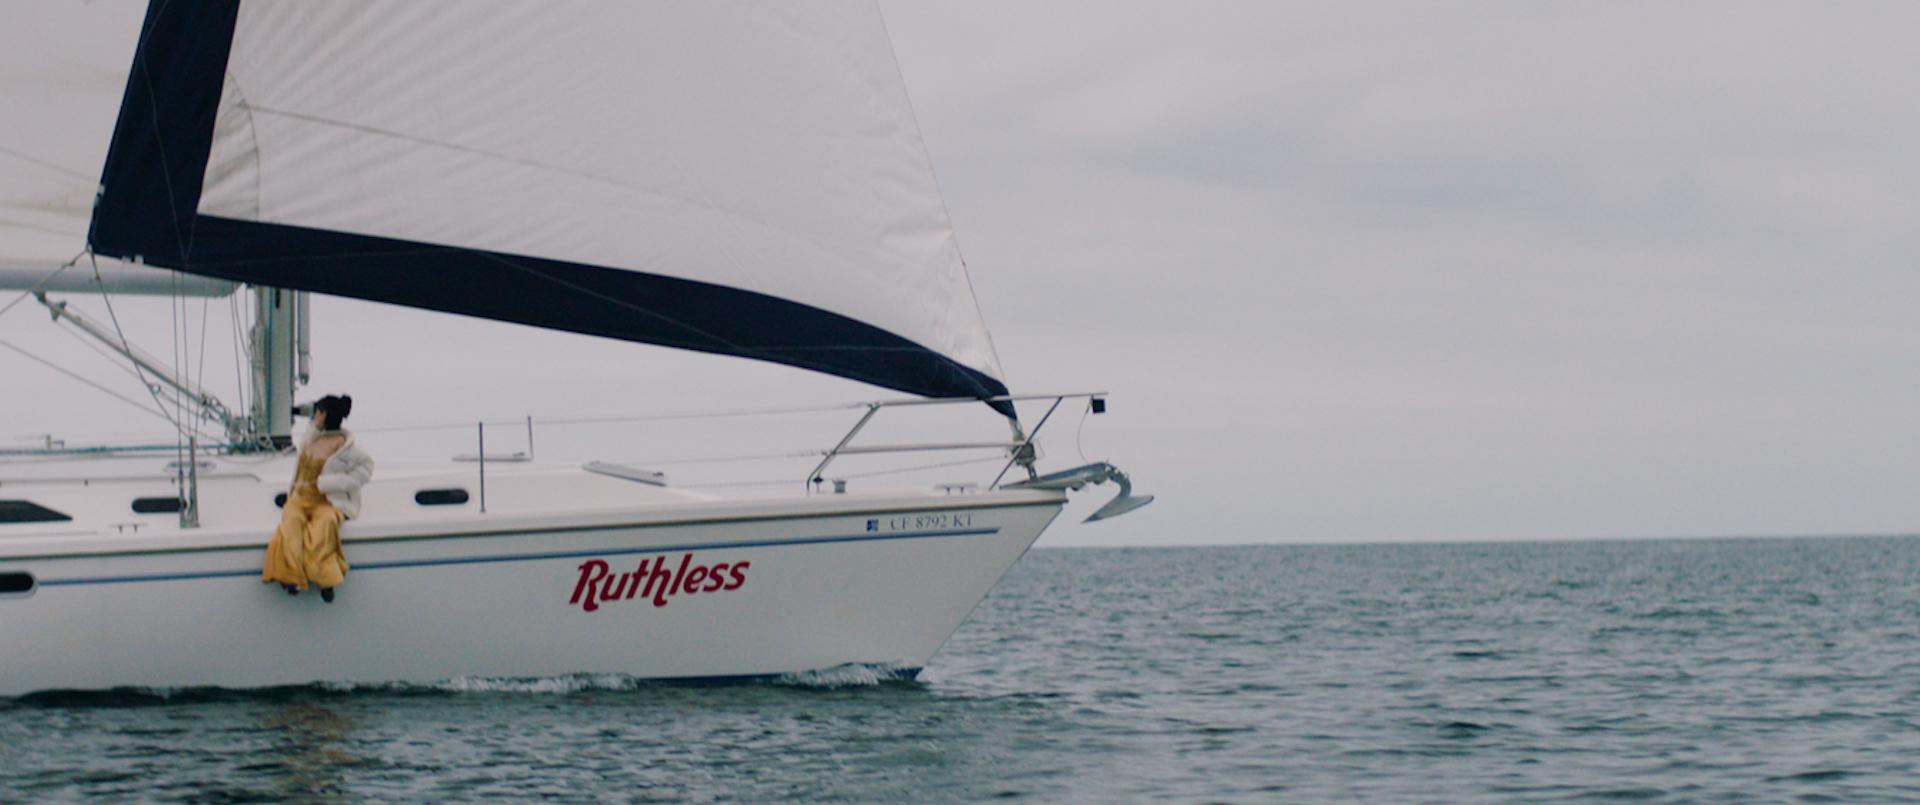 Ruthless - The Marías